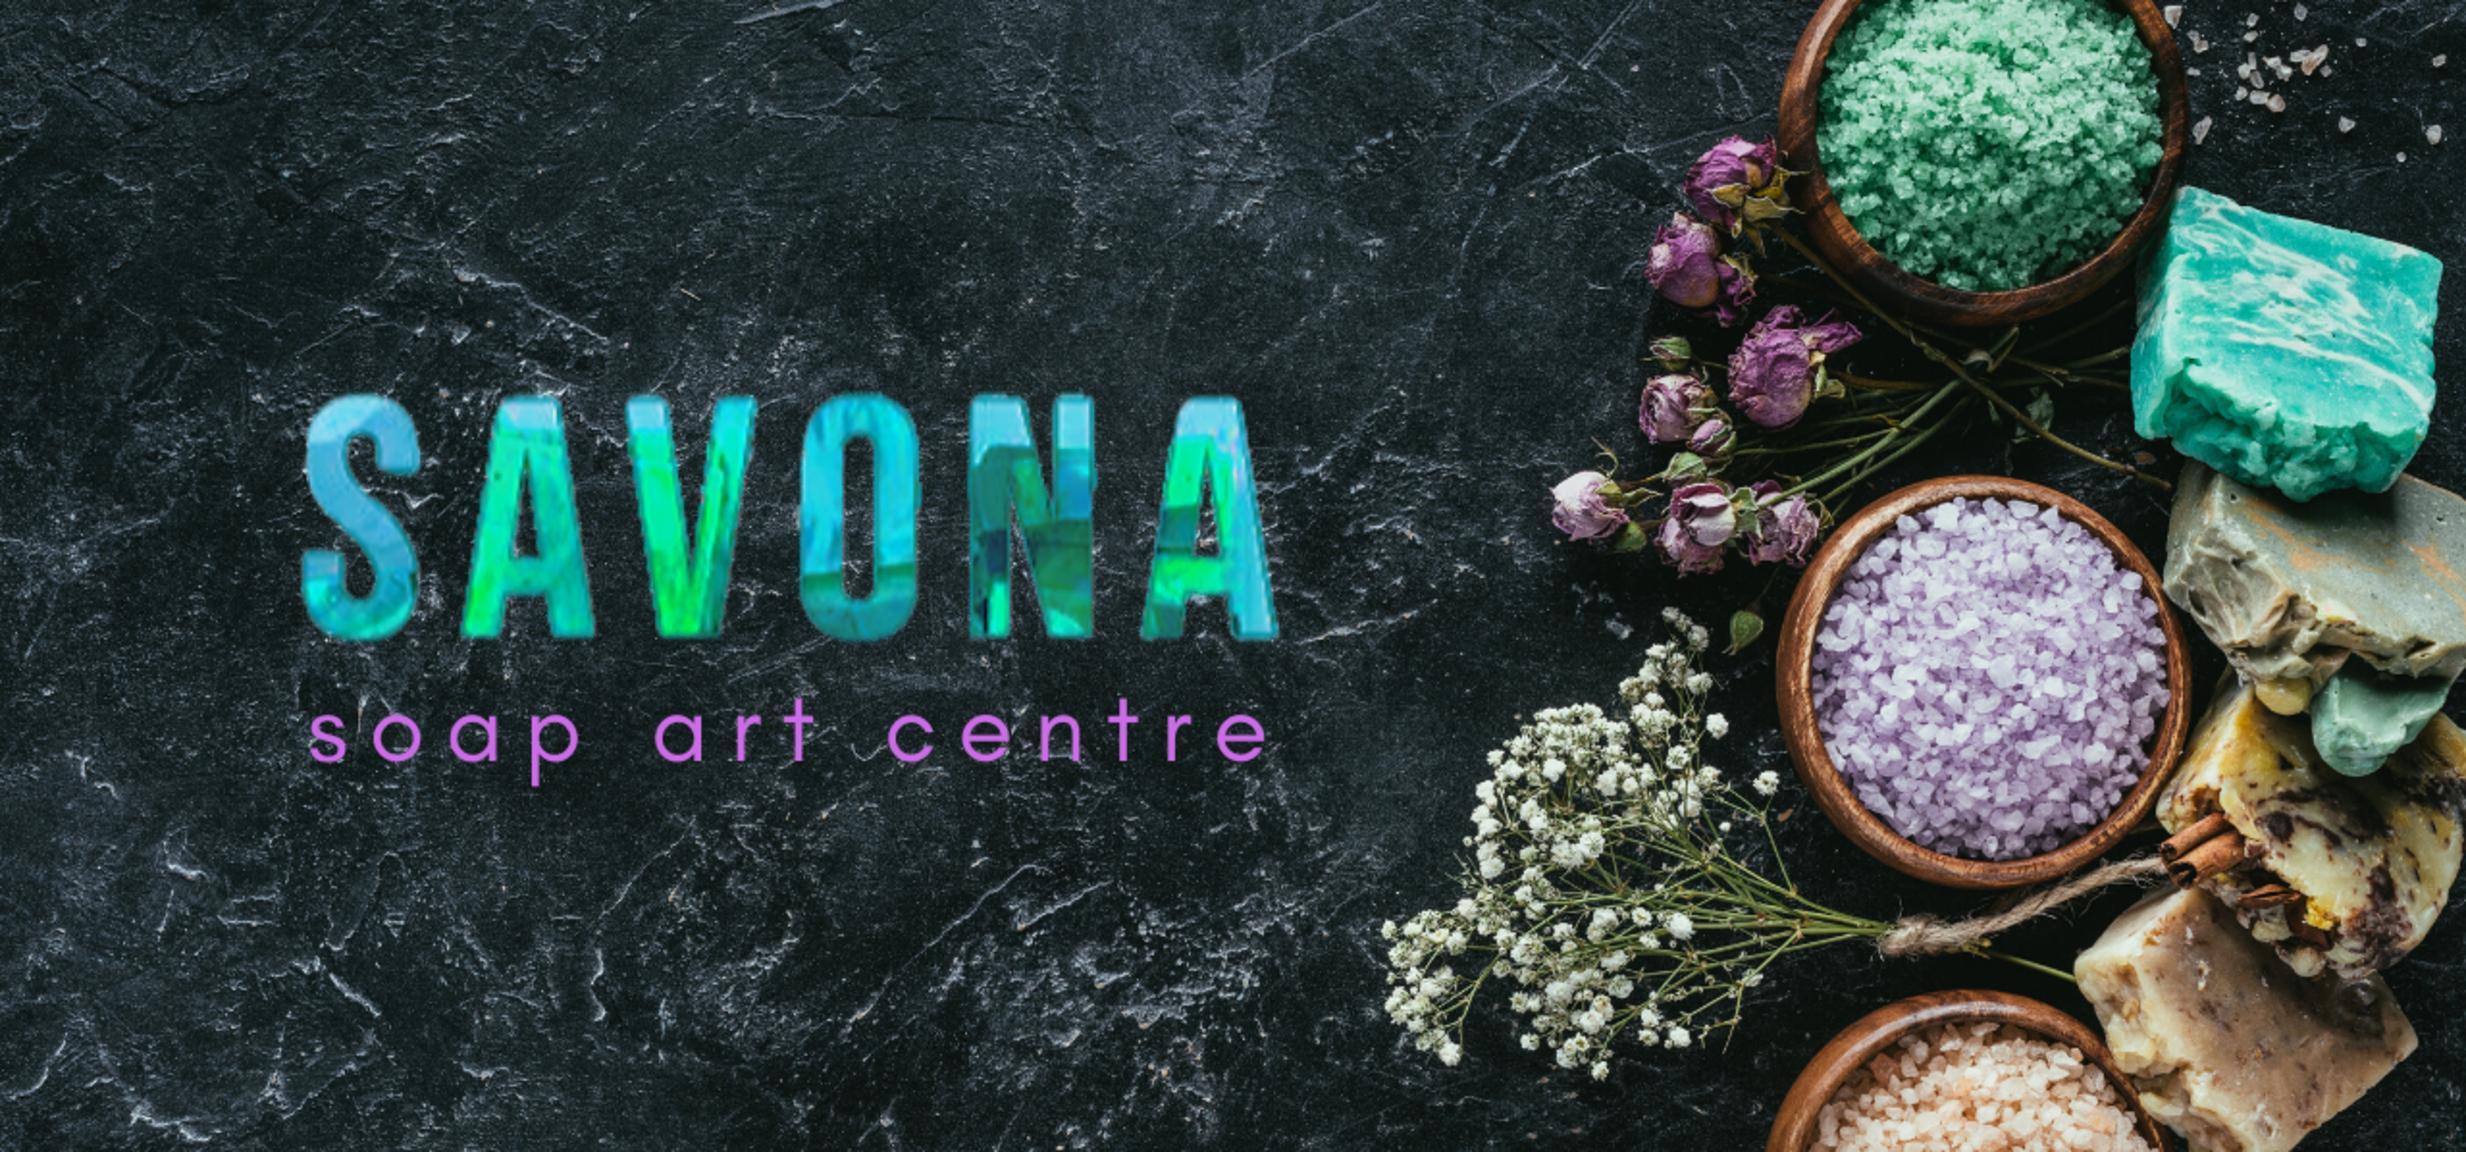 Giới thiệu Savona